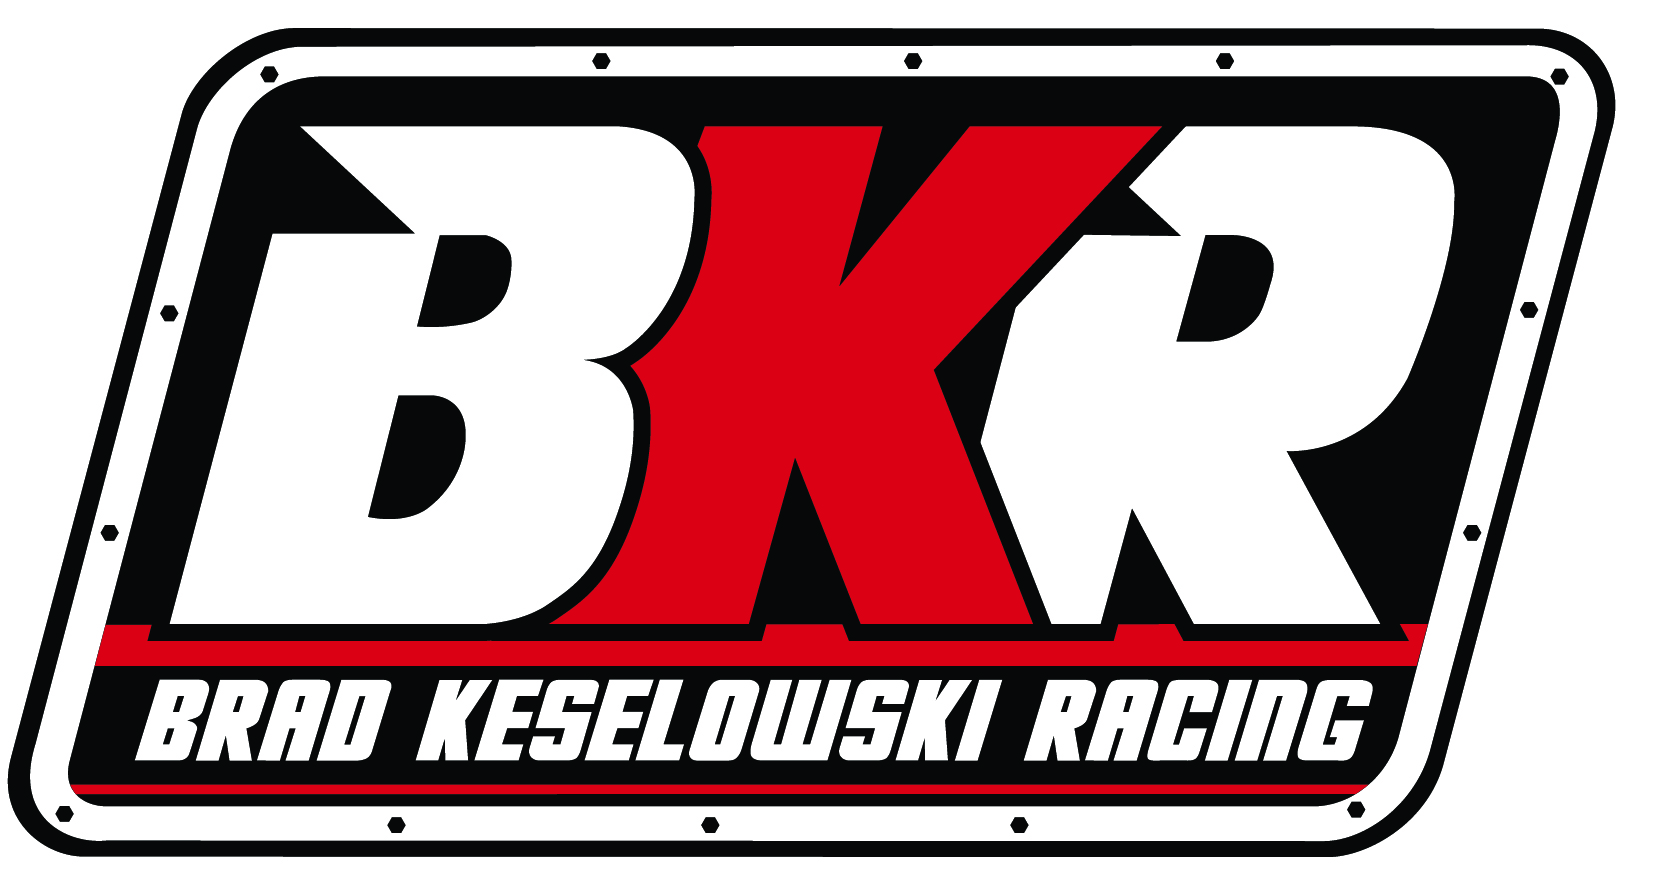 Tundra Racing Series >> Brad Keselowski Racing - Wikipedia